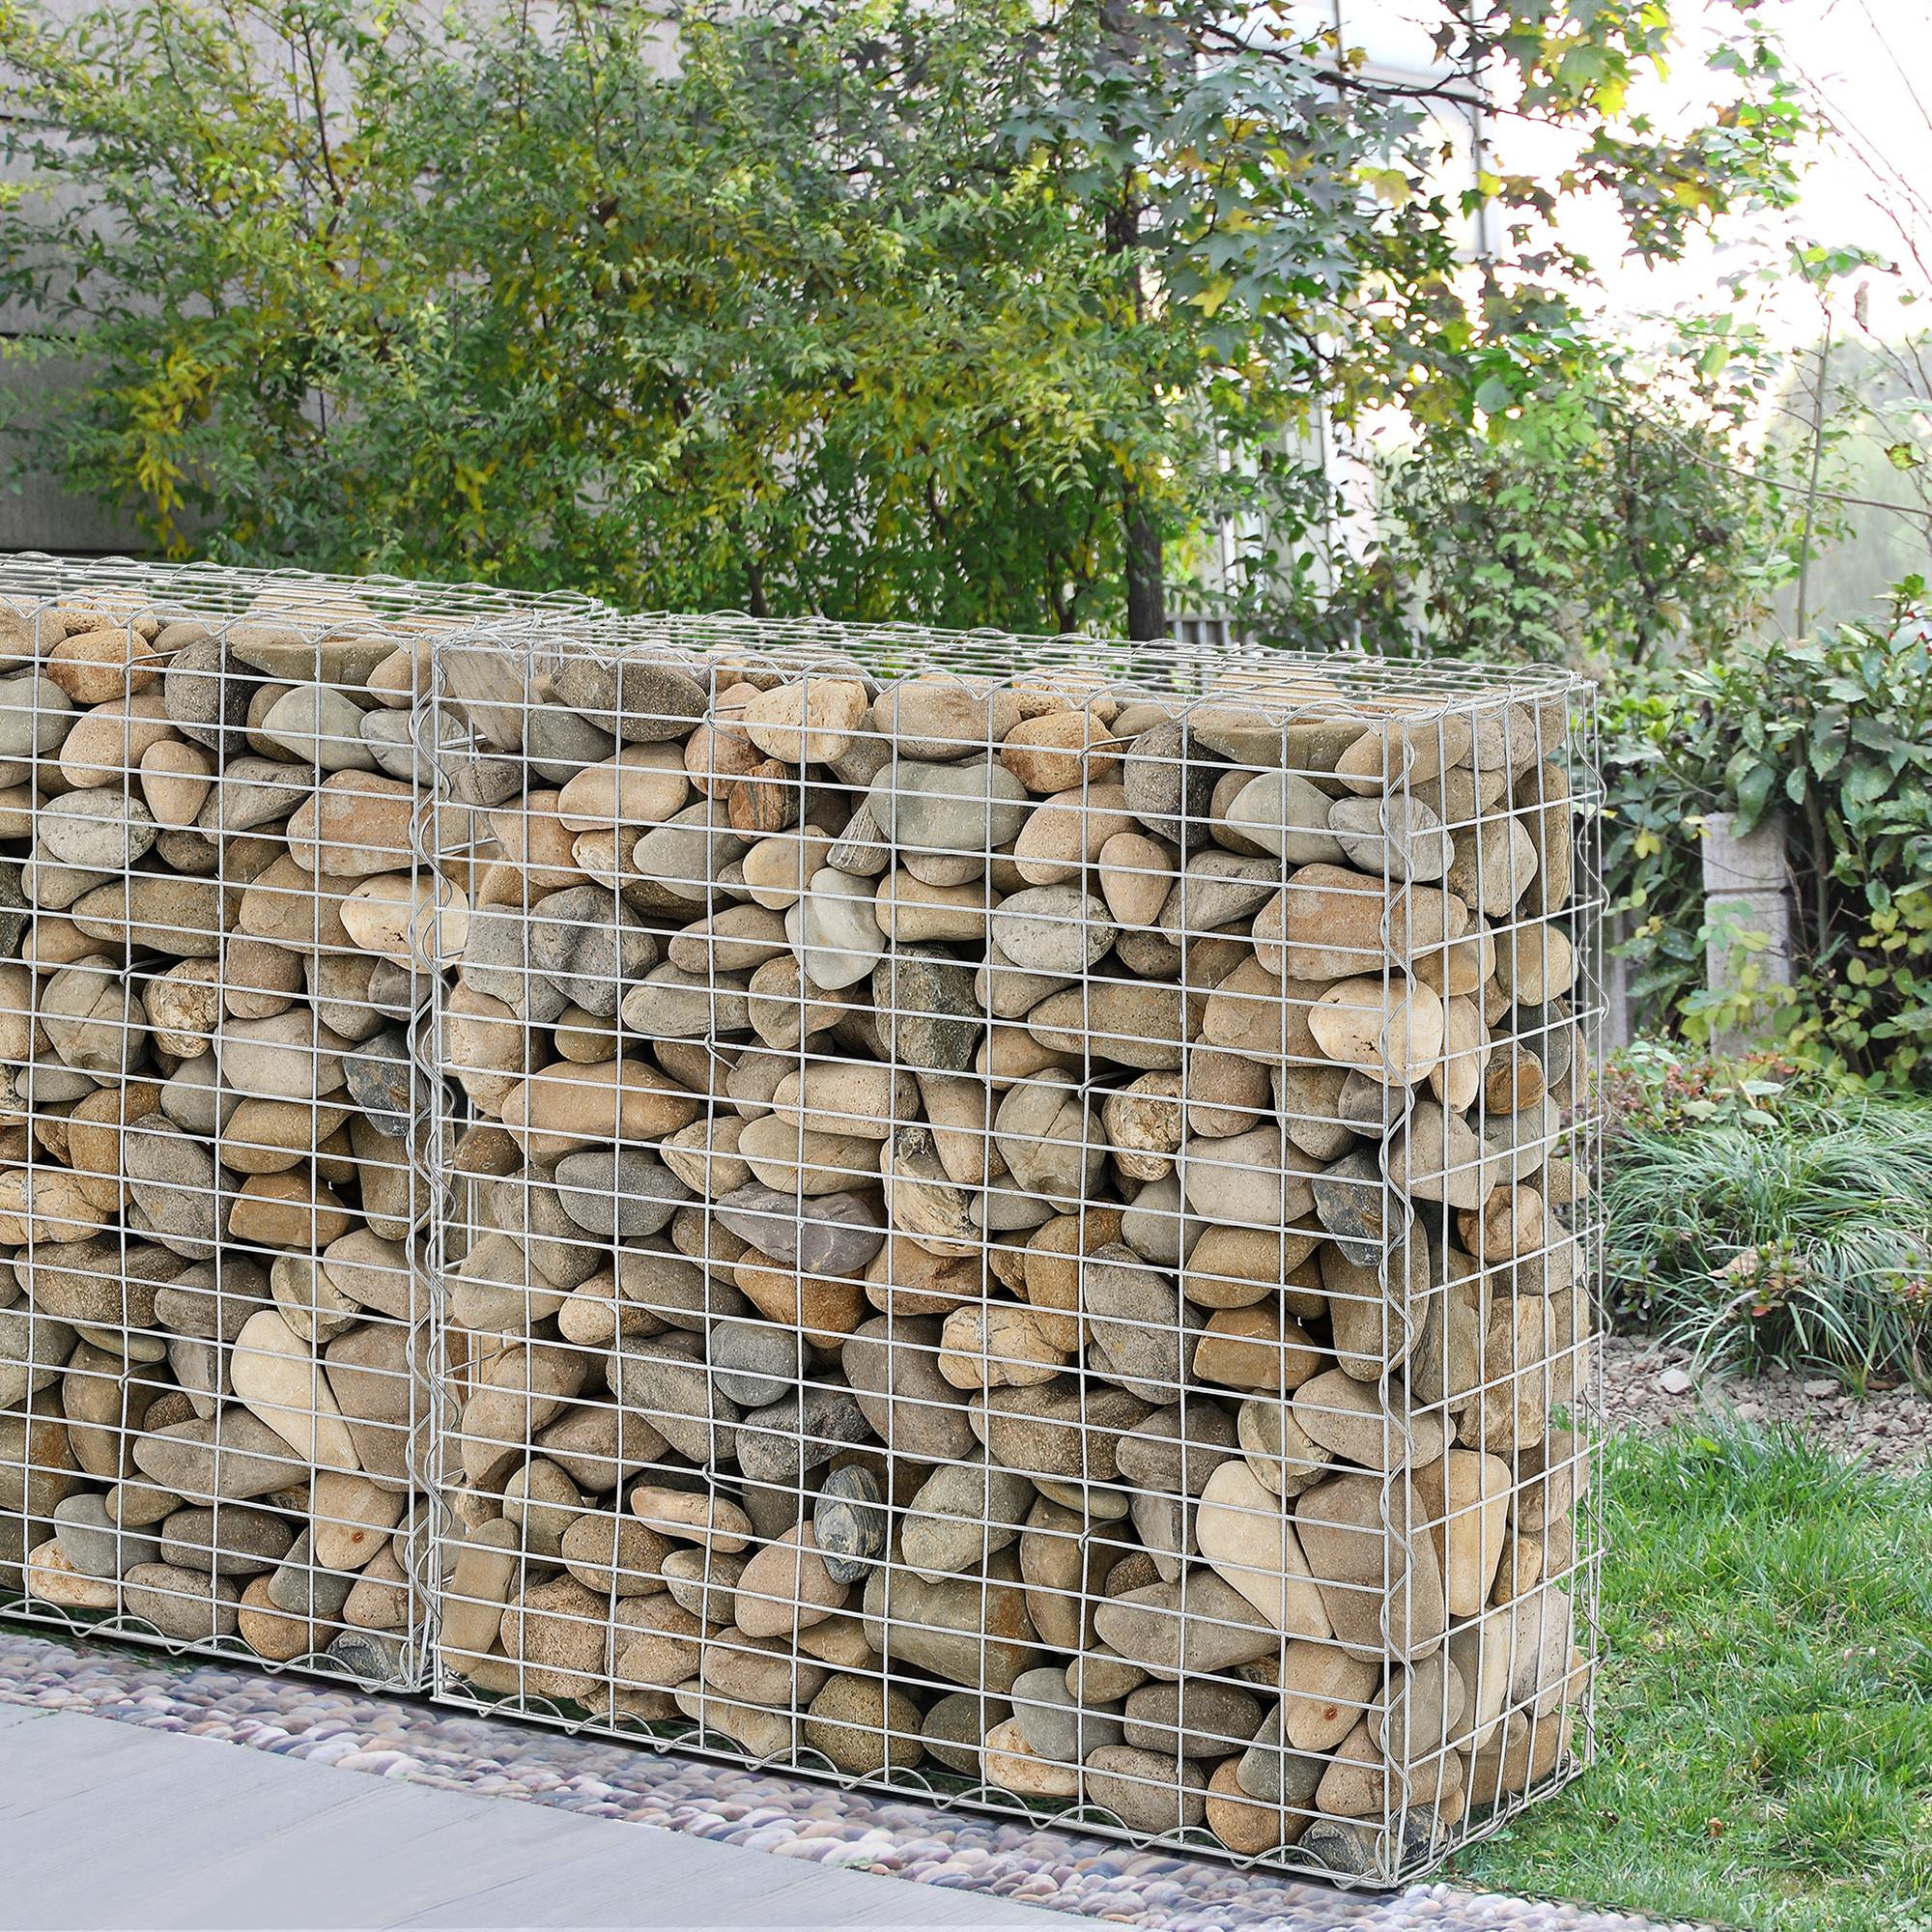 5 x gabions each 100x100x30cm stone gabione stone basket wall wall stone gabions ebay. Black Bedroom Furniture Sets. Home Design Ideas